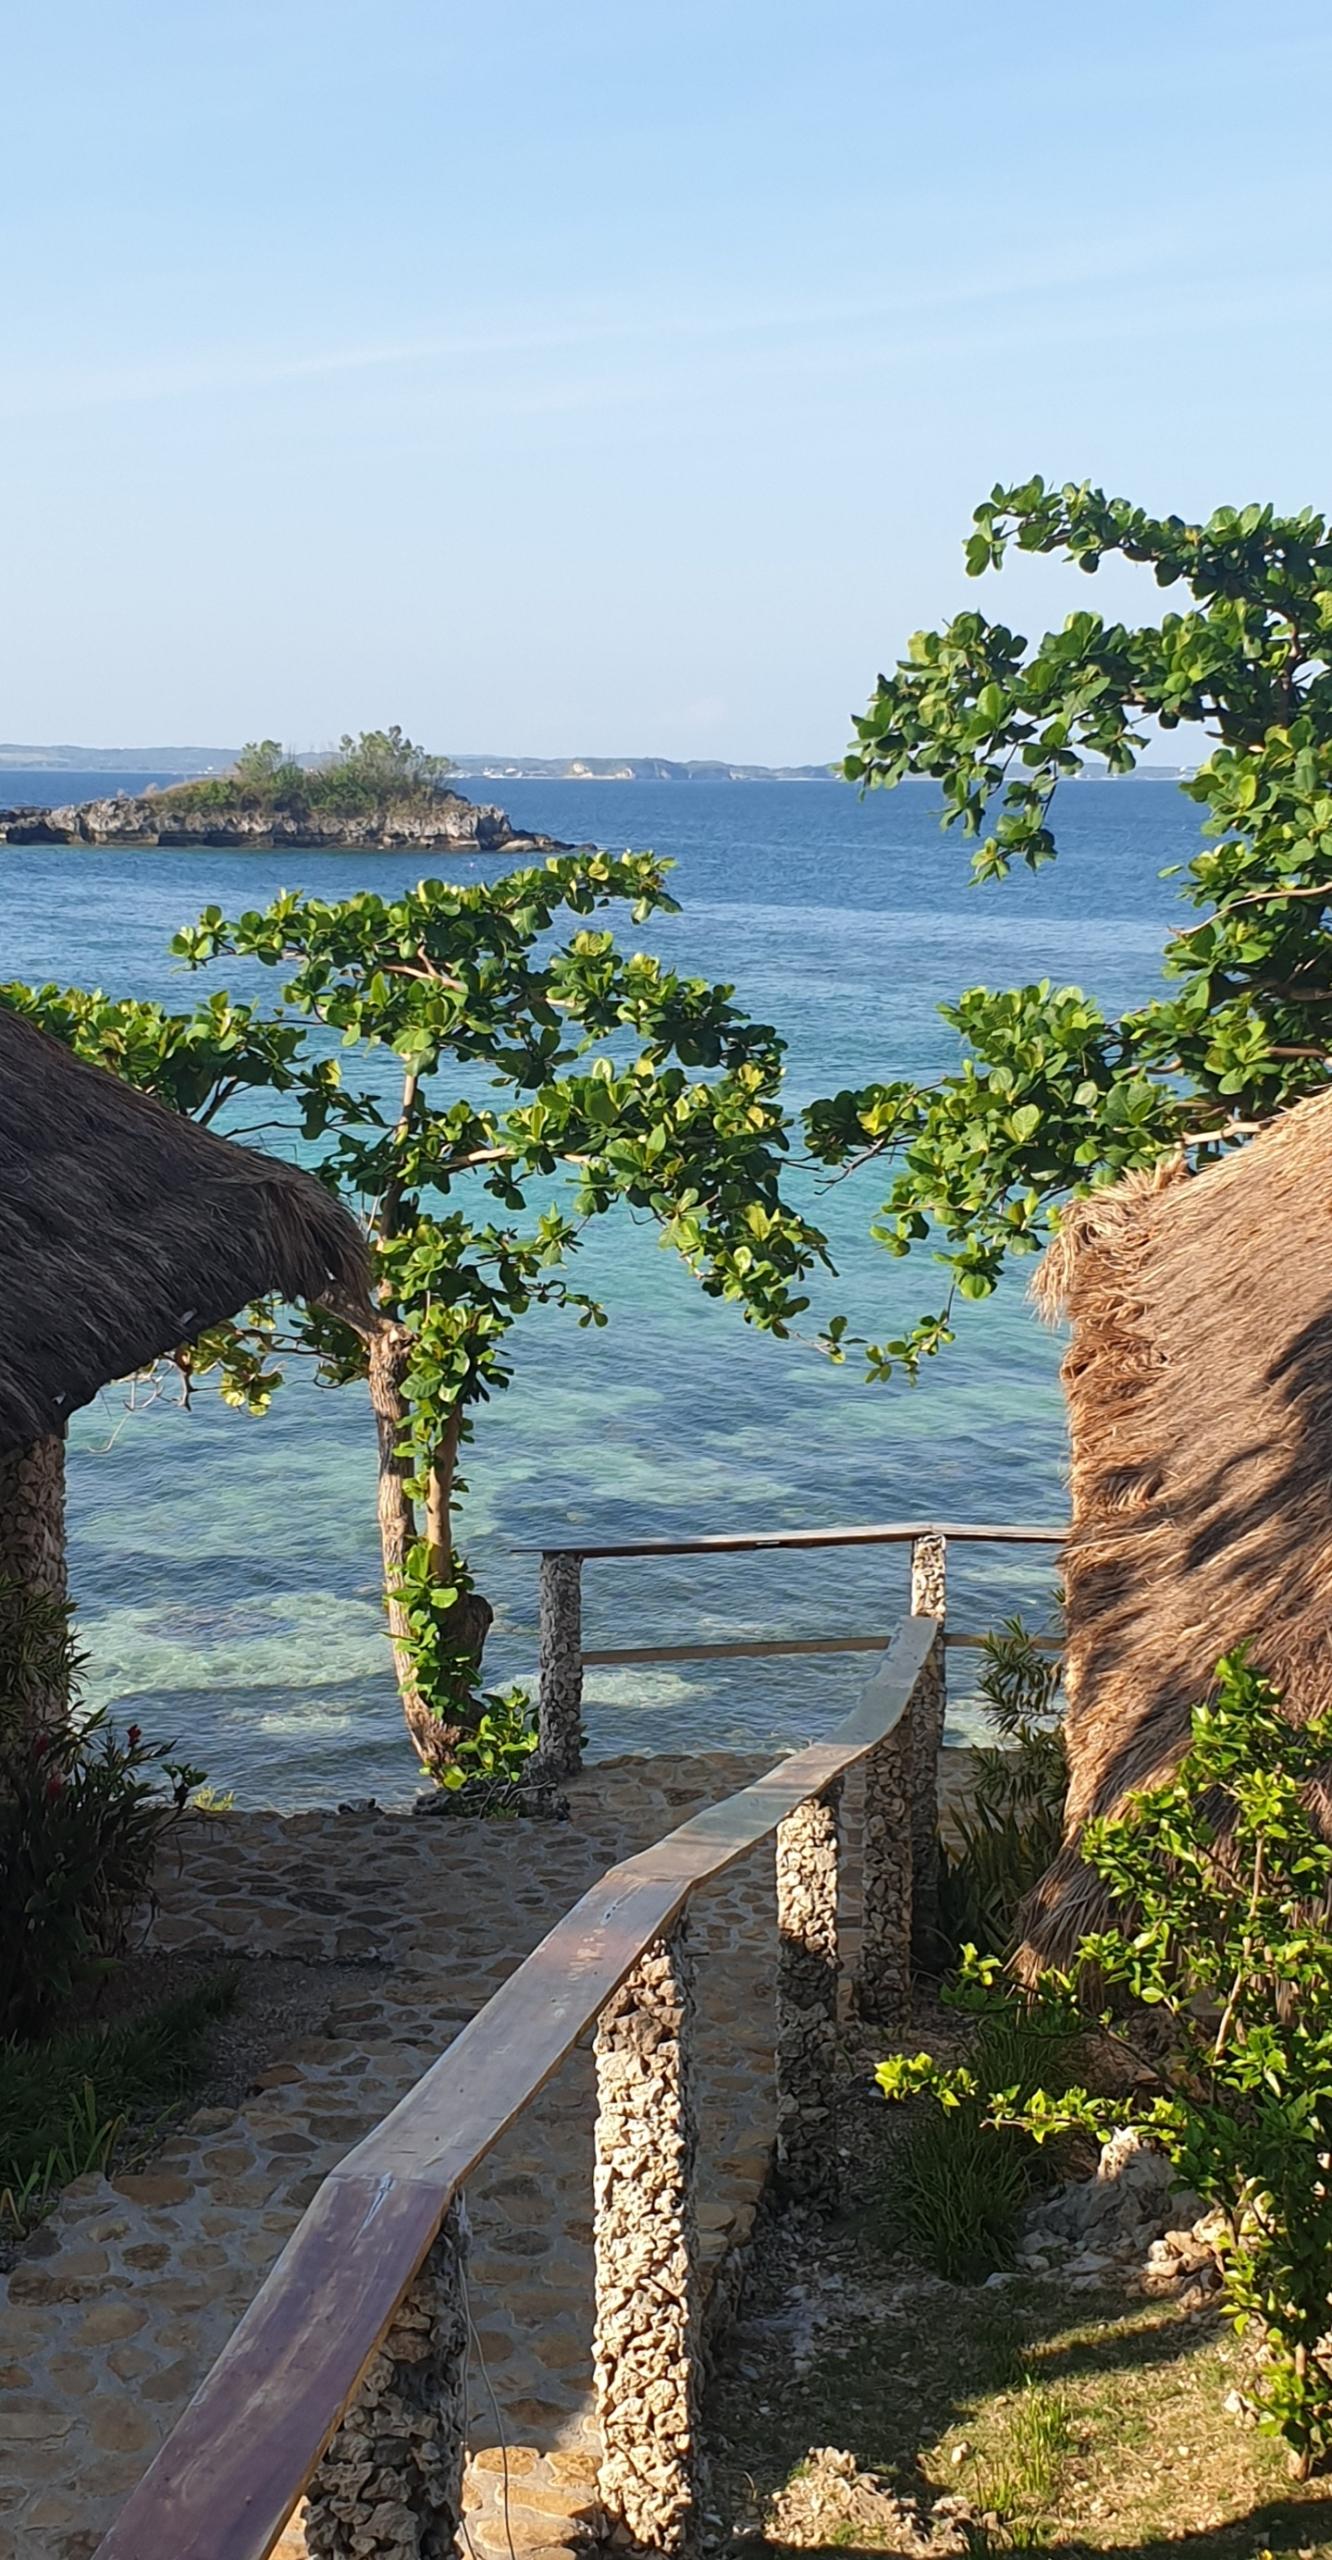 Isola di Malapasqua, Olgiata Diving Febbraio 2020, People 26